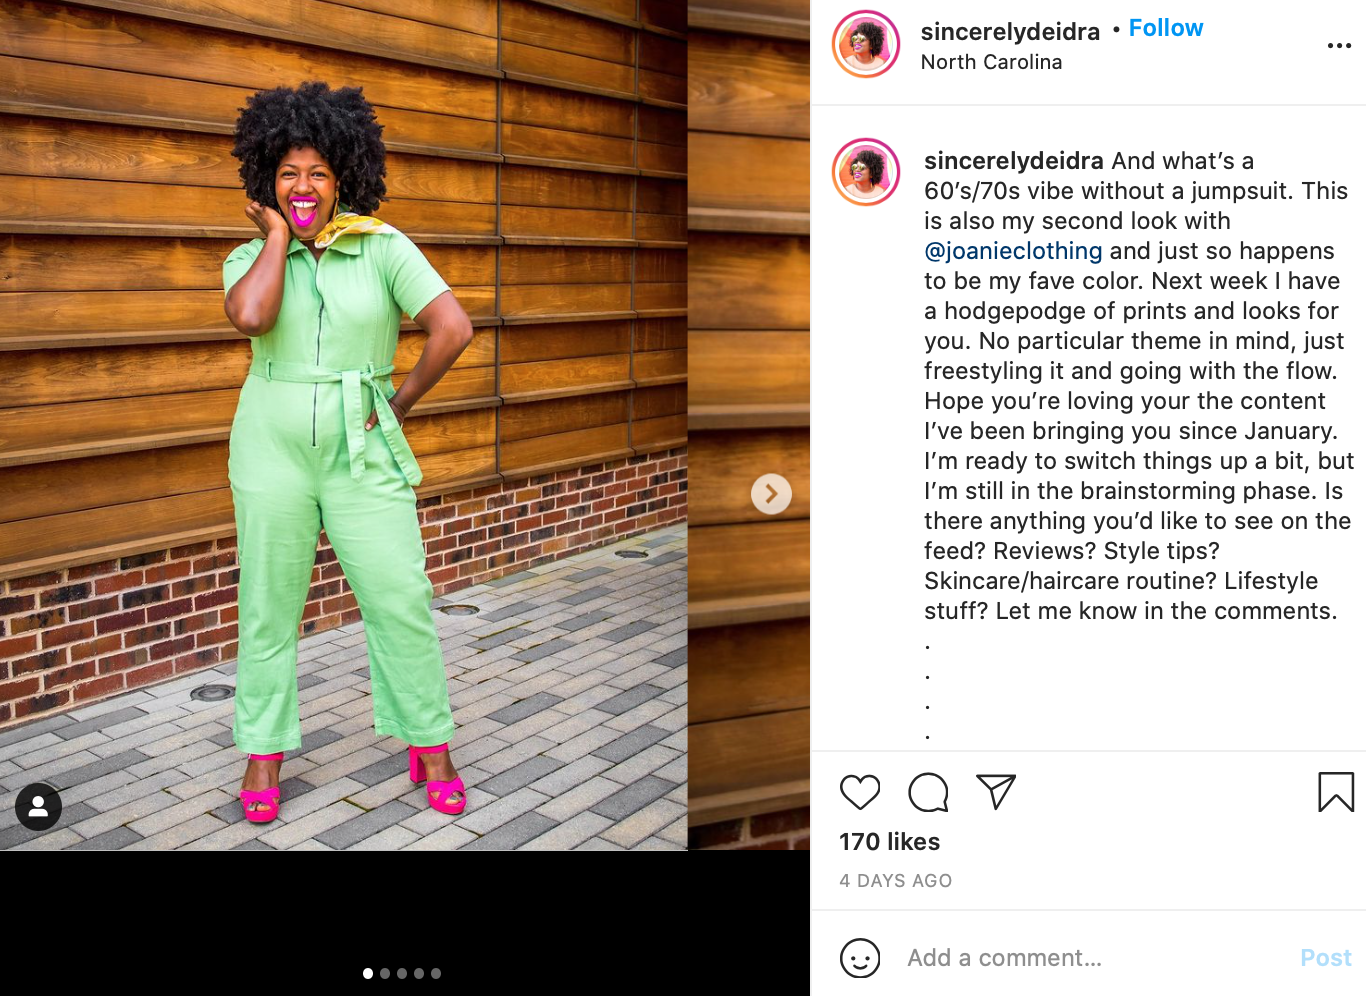 Instagram influencer promoting fashion brand.